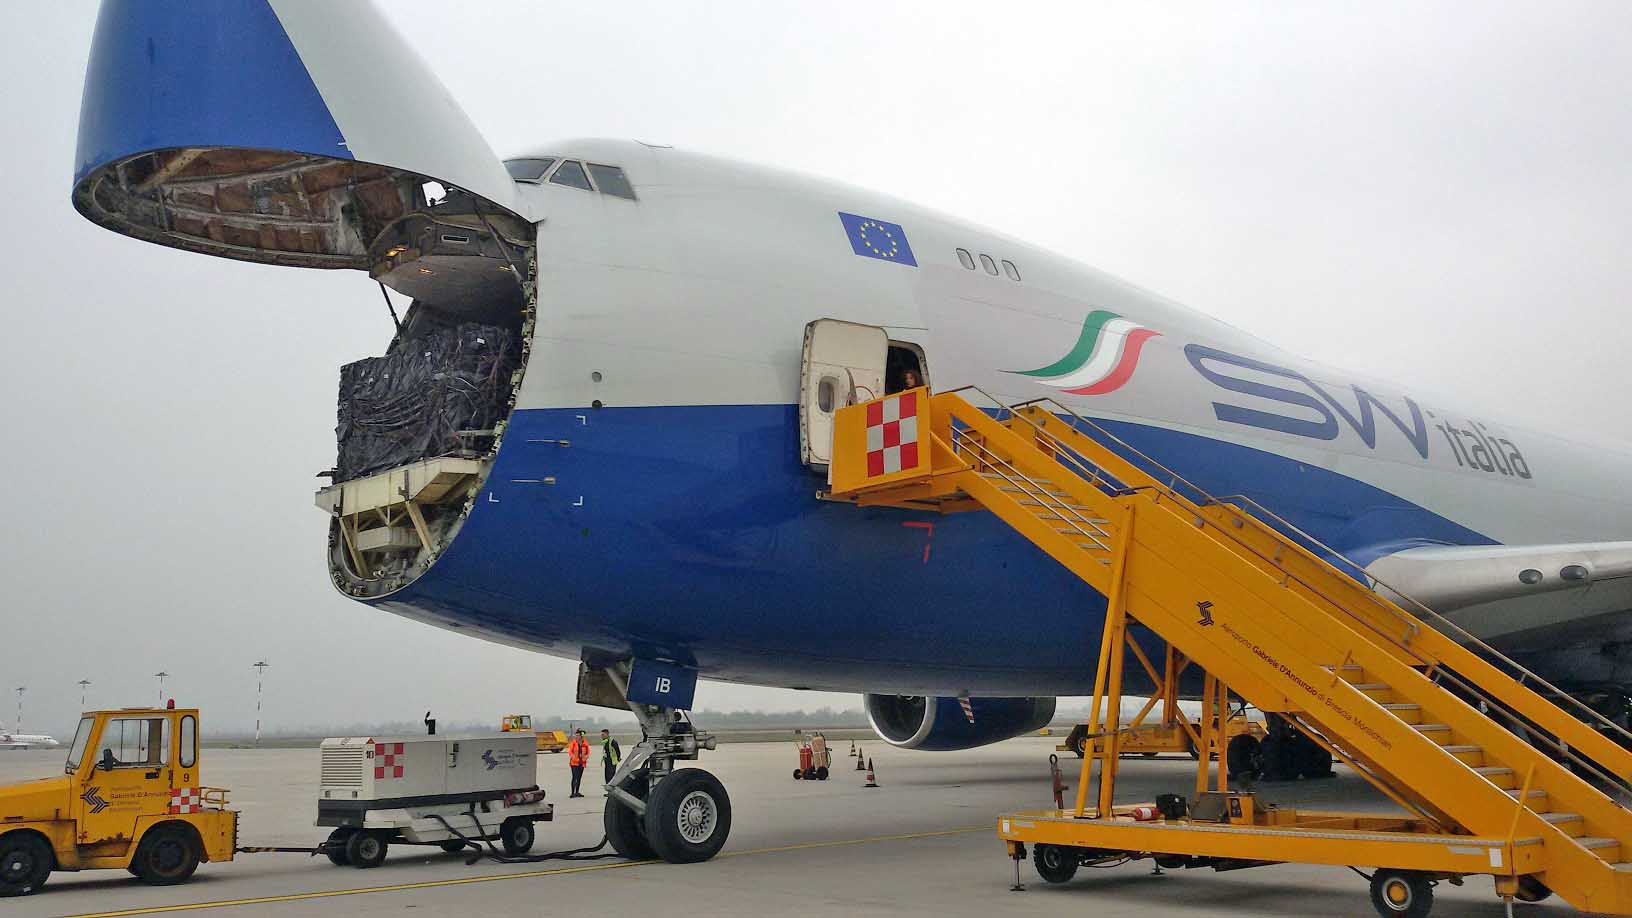 Aeroporto montichiari brescia aero cargo Silk Way Italia merci Alibaba 2